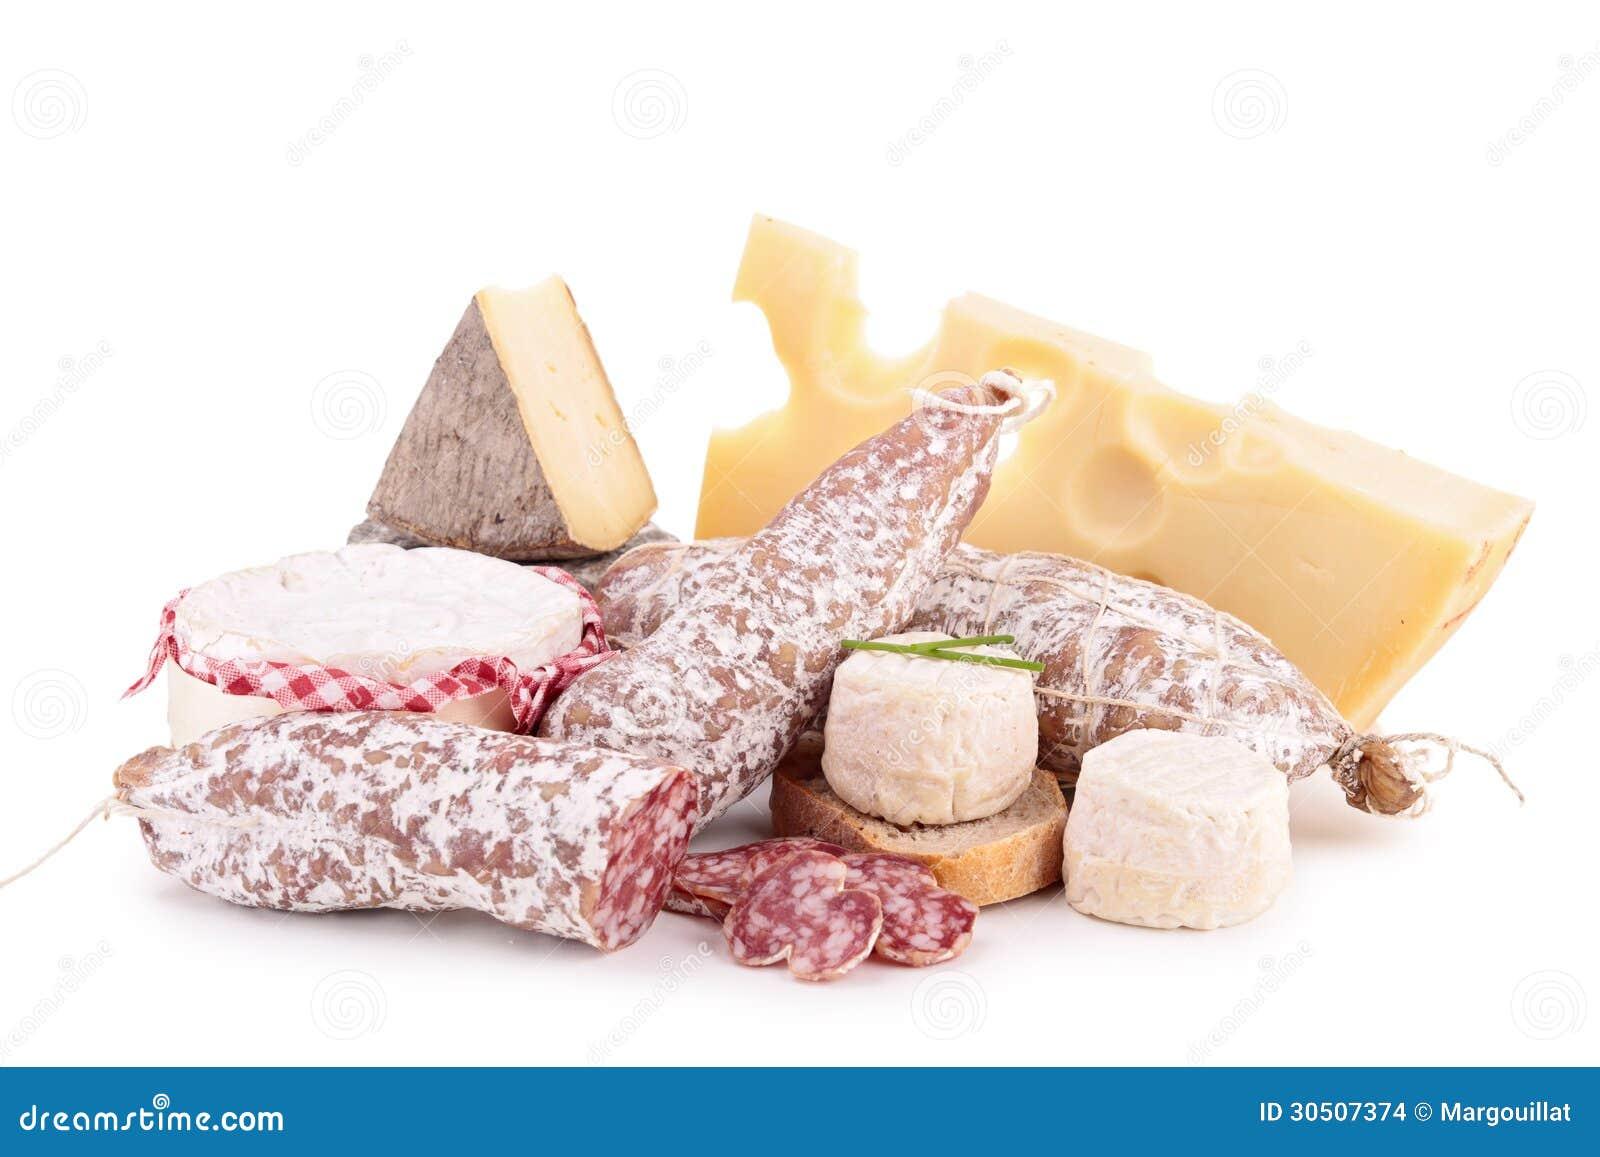 Сыр, сосиска